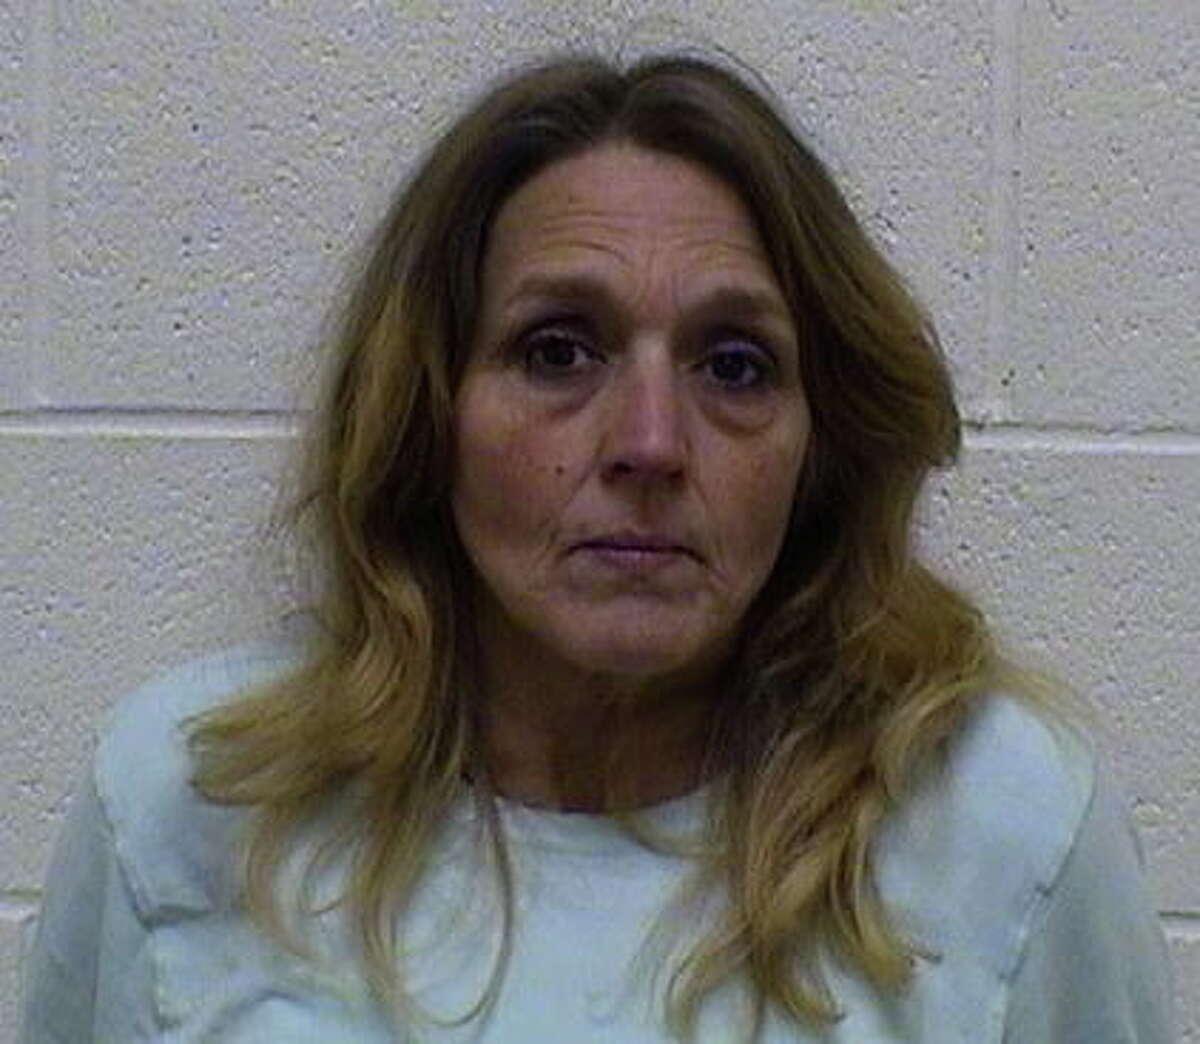 Laura Perez-Shaw, 49, of Torrington